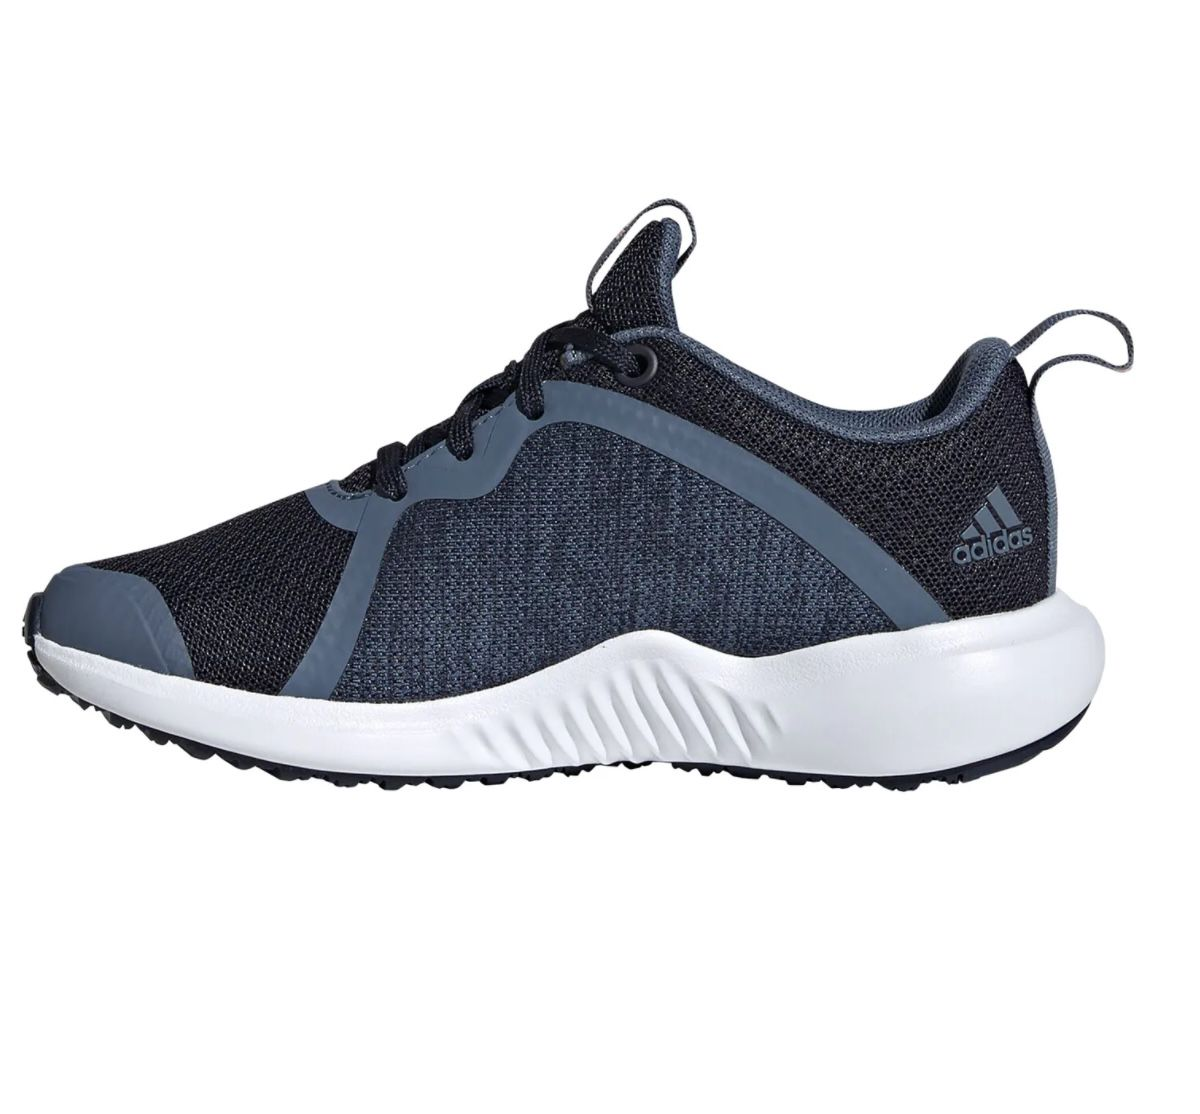 adidas Performance Fortarun X Kids-Sneaker für 17,44€ (statt 30€)